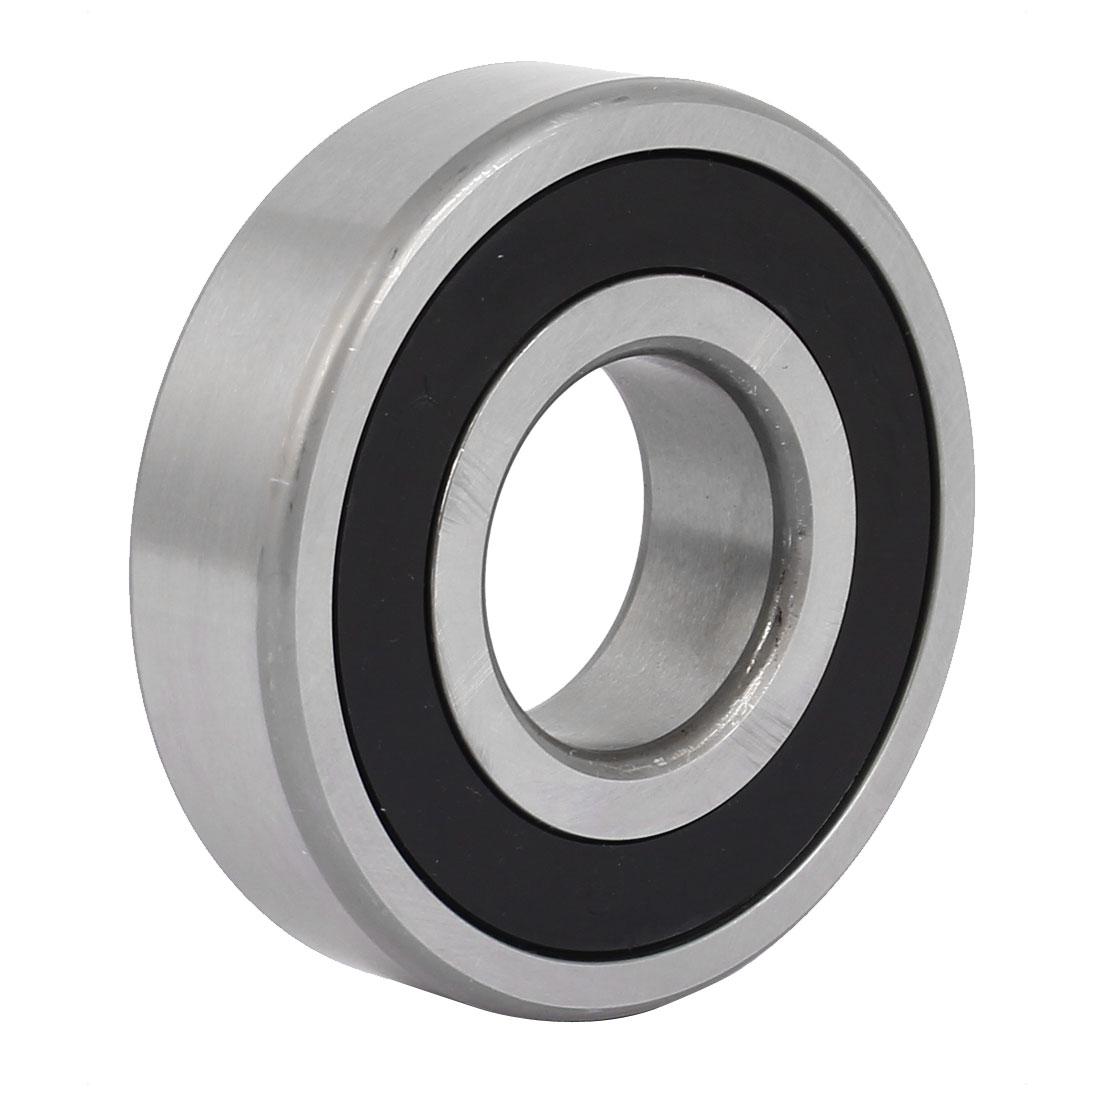 RZ6307 Double Shielded Deep Groove Ball Bearing 80mmx35mmx21mm